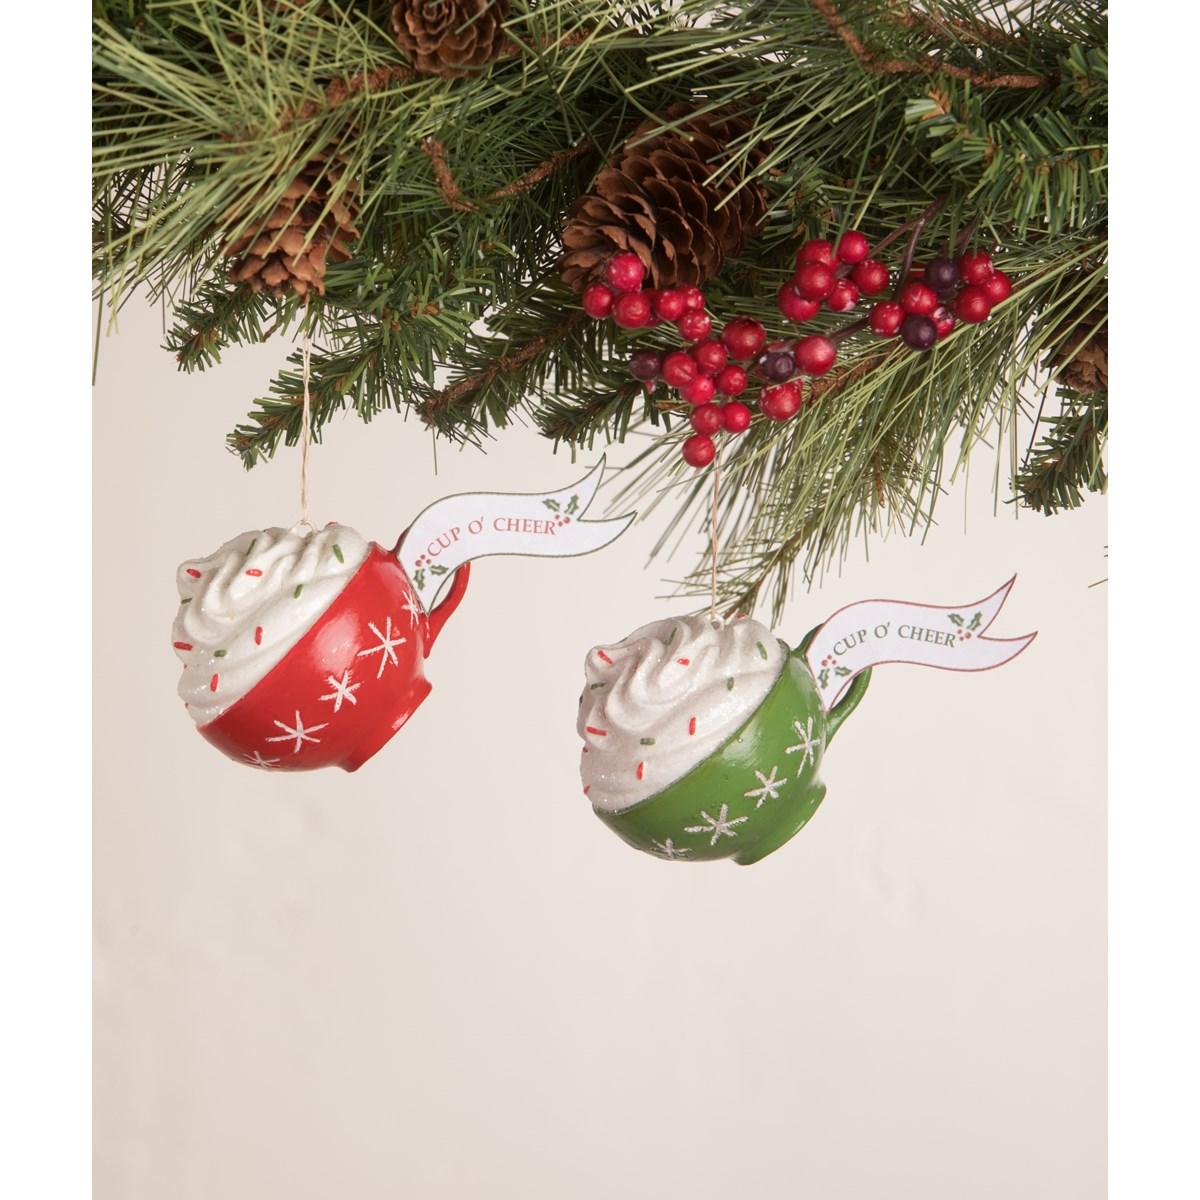 Cup O' Cheer Ornament 2A